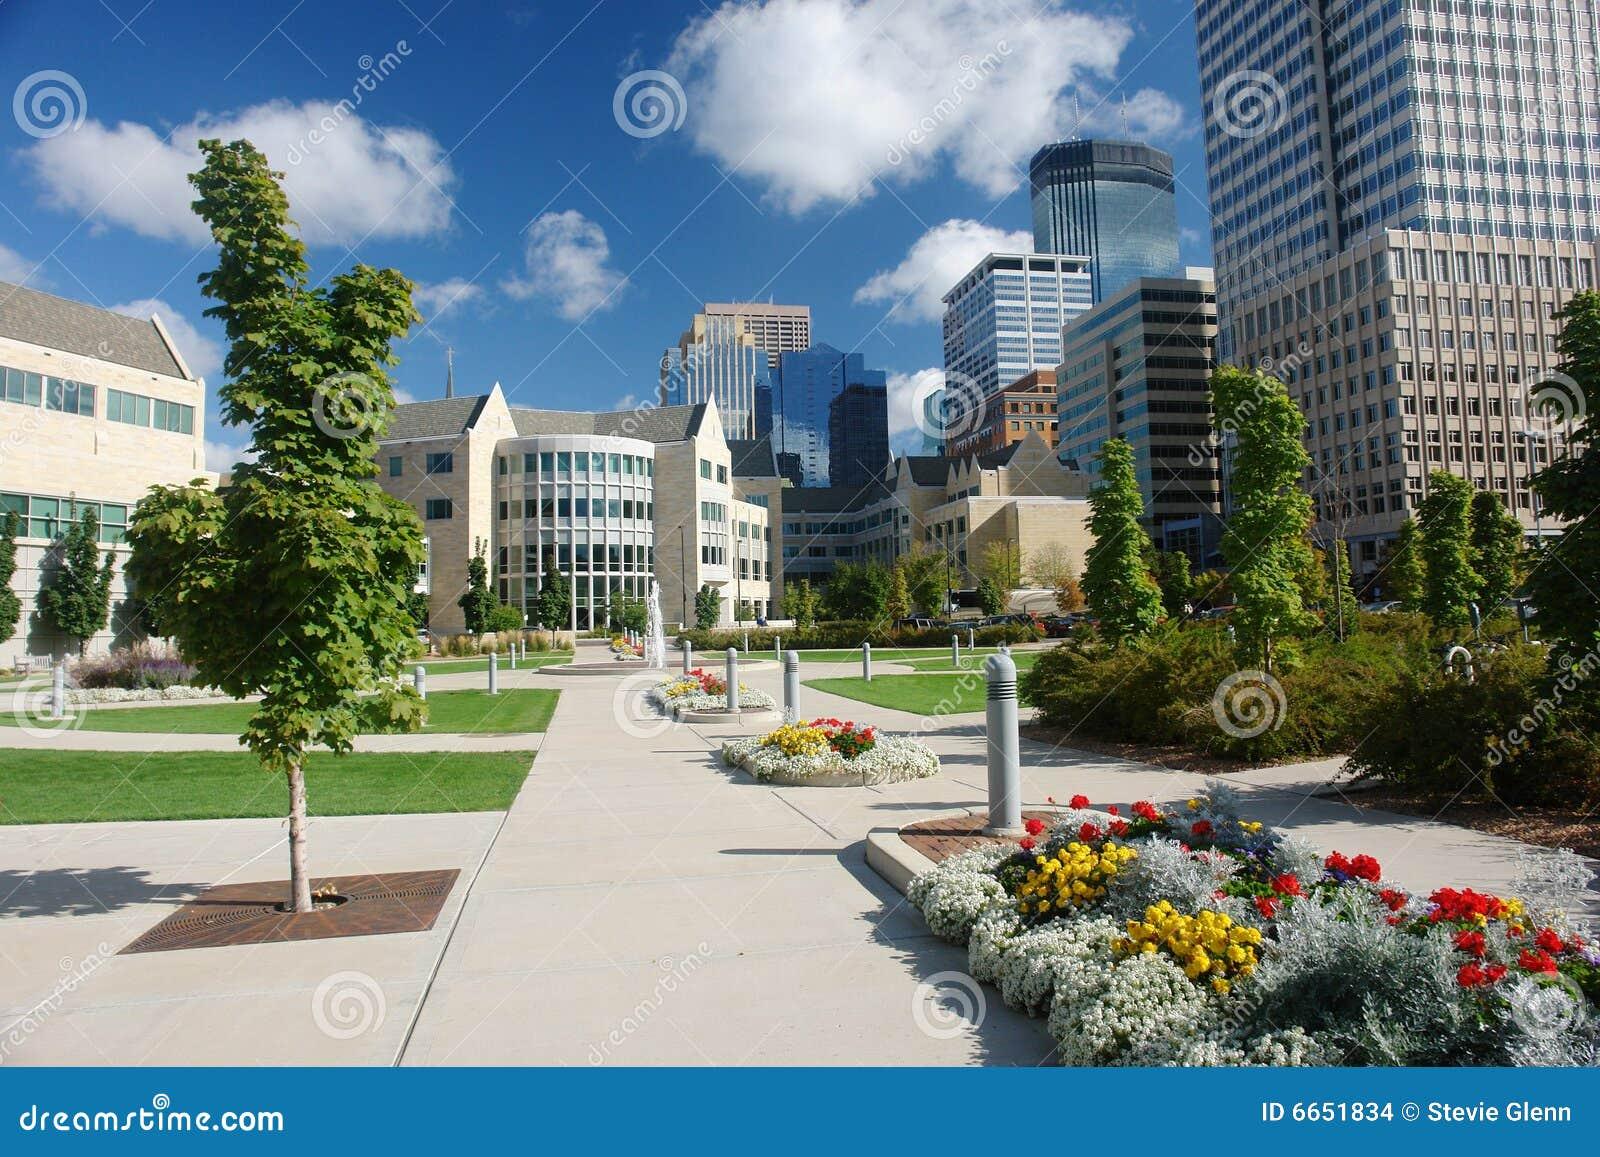 imagens de stock Ambiente Urbano Bonito - Baixe 30 7540d5639a45